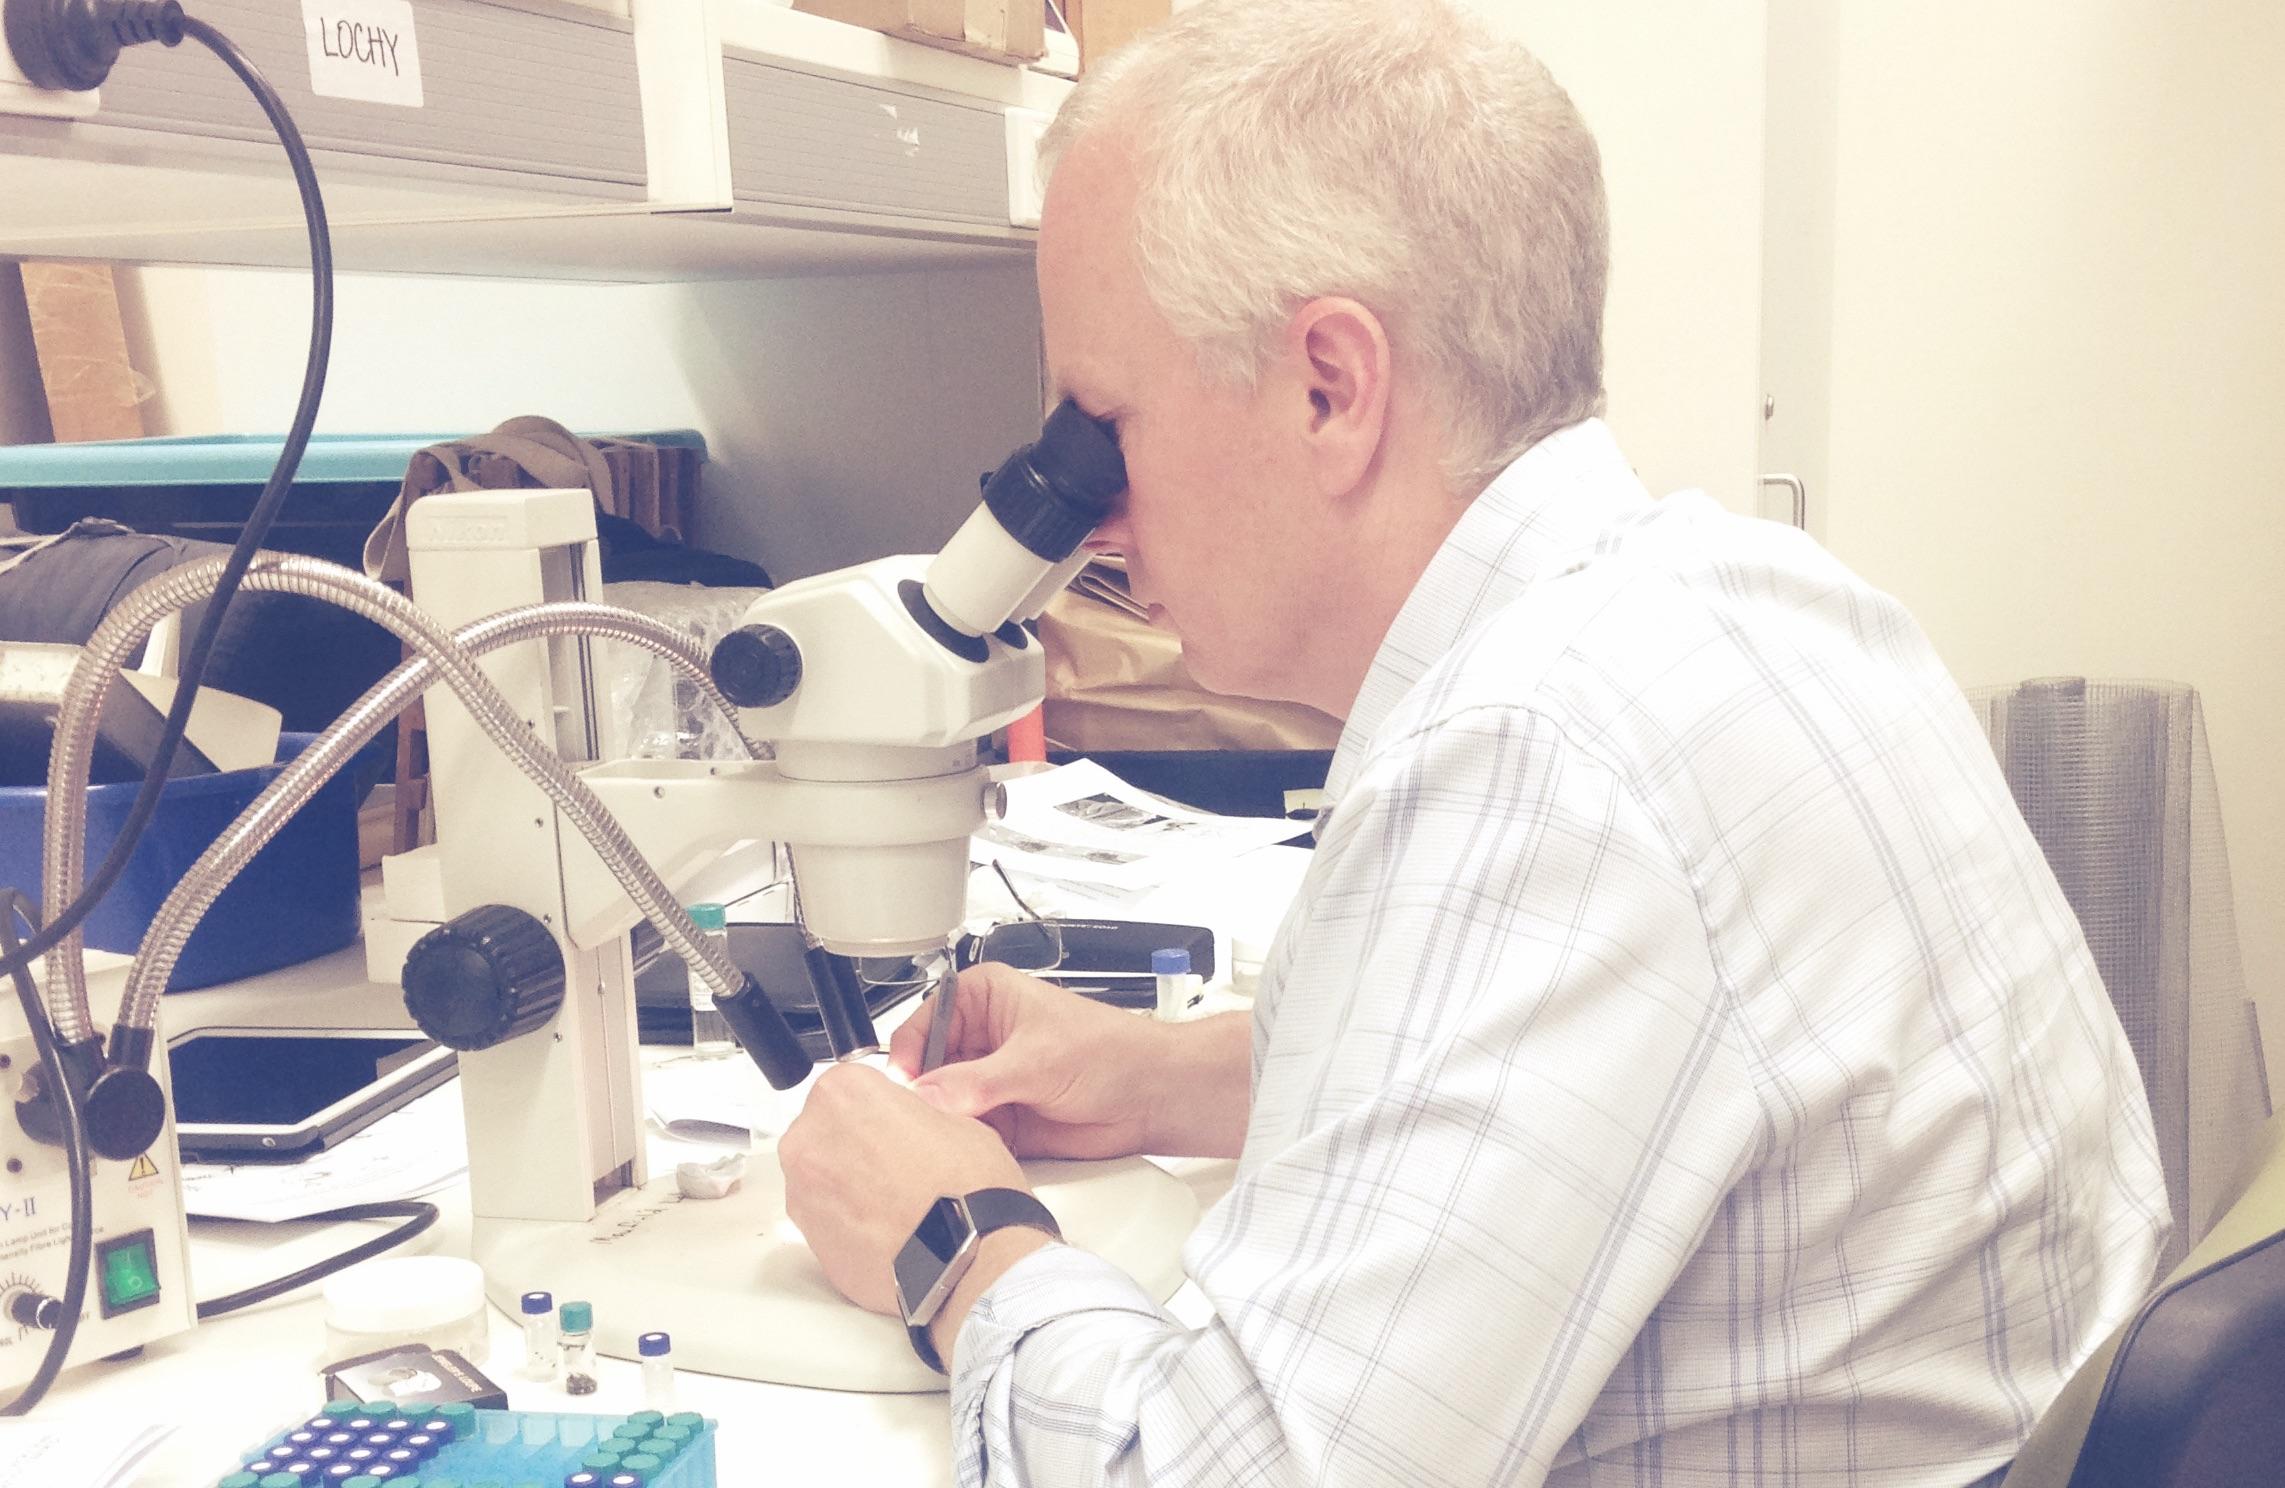 Phil Lester dissecting Hylaeus bees for analysis _Q'land Uni - Poolside rmx-B.jpg